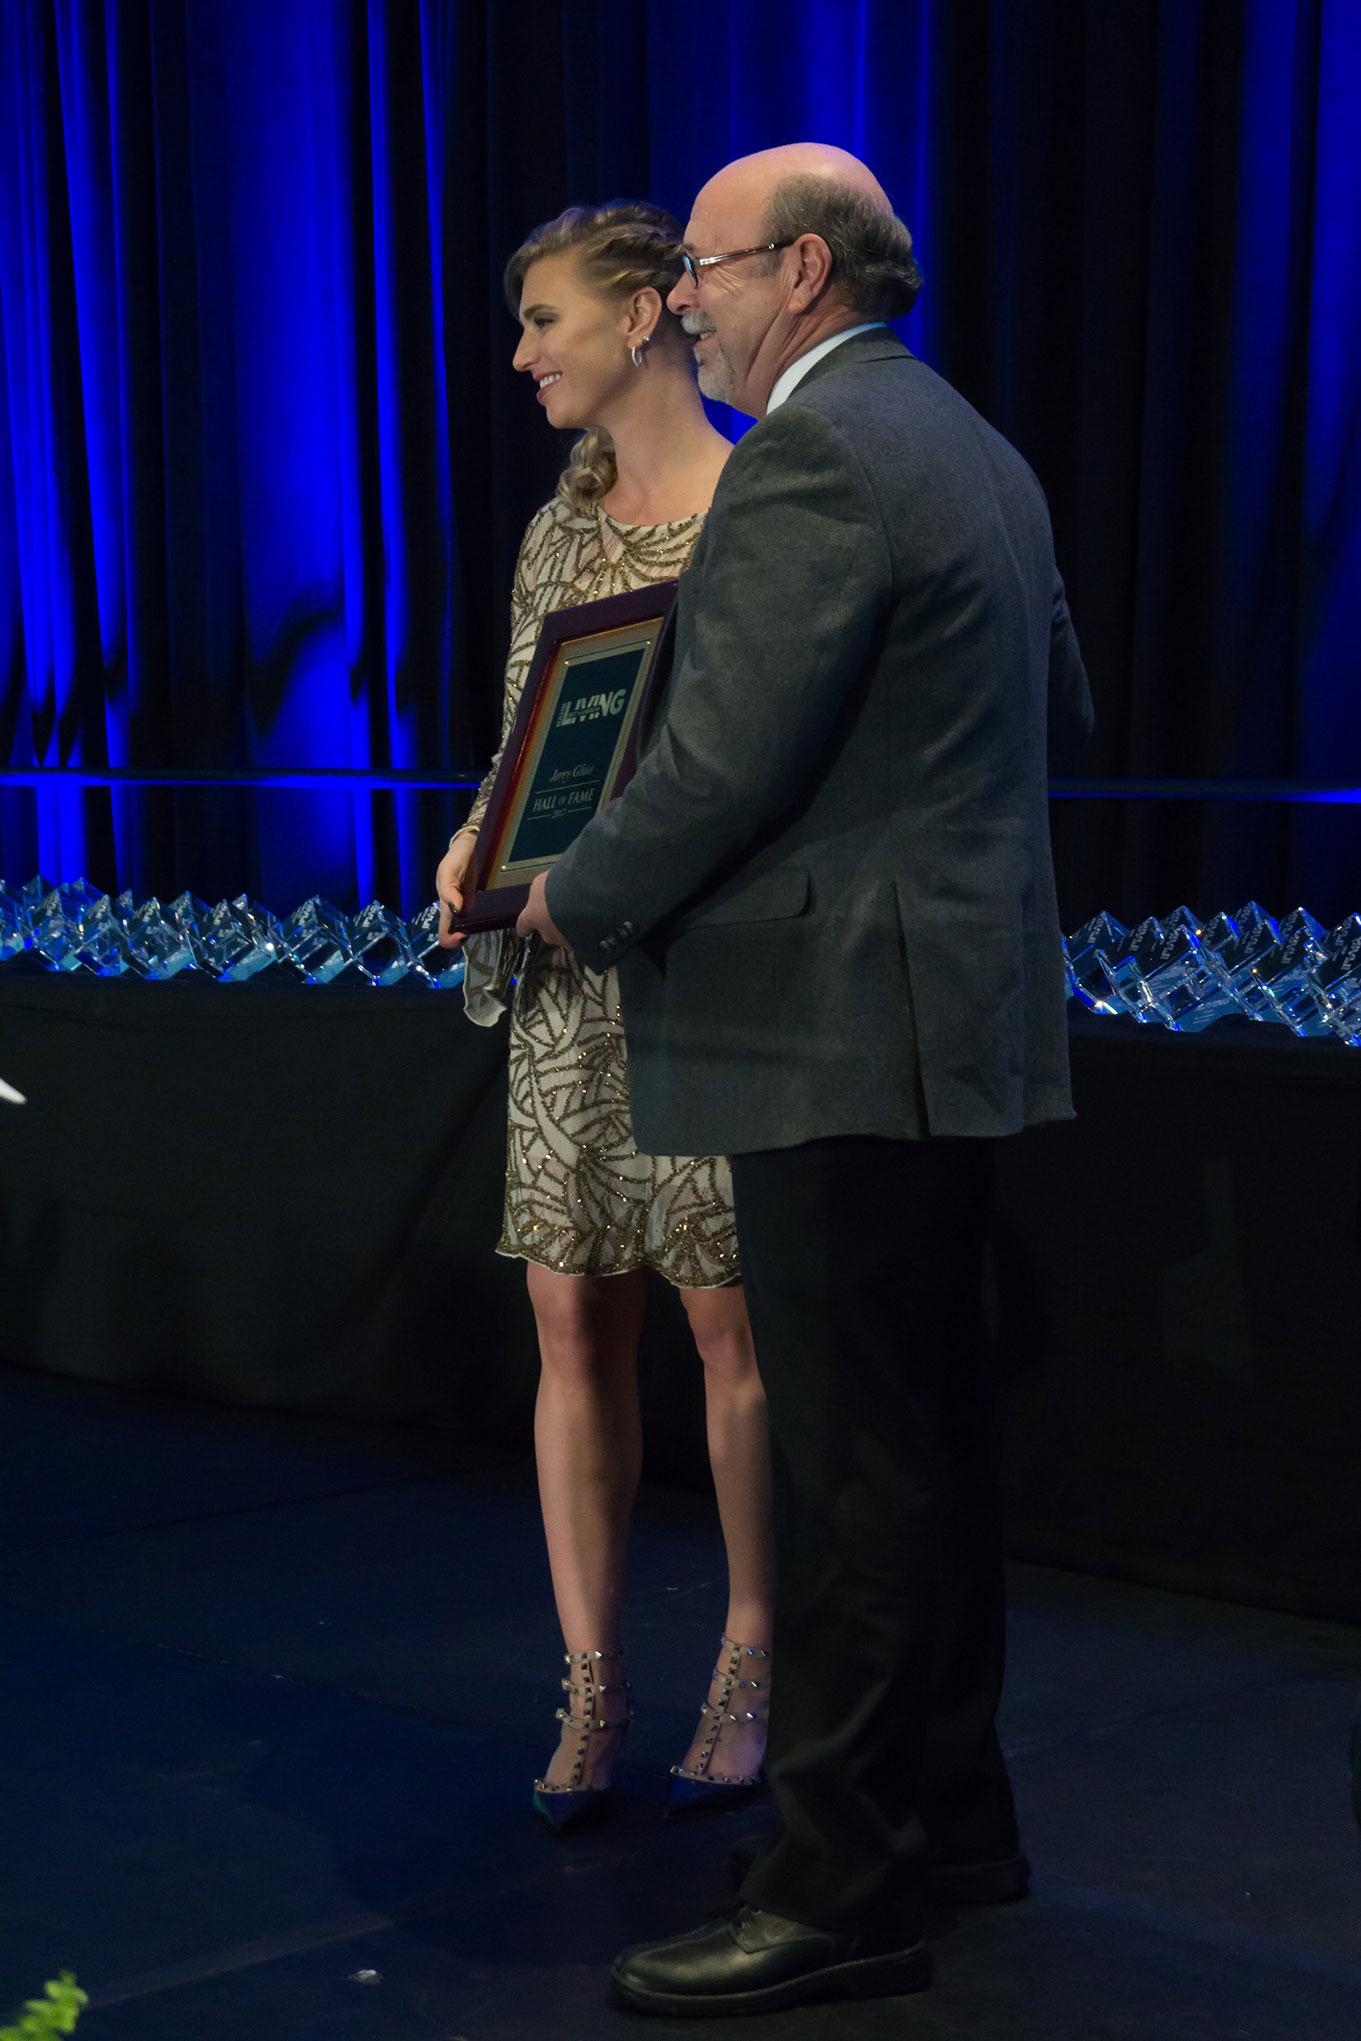 Jerry Gloss accepts BALA Hall of Fame Award